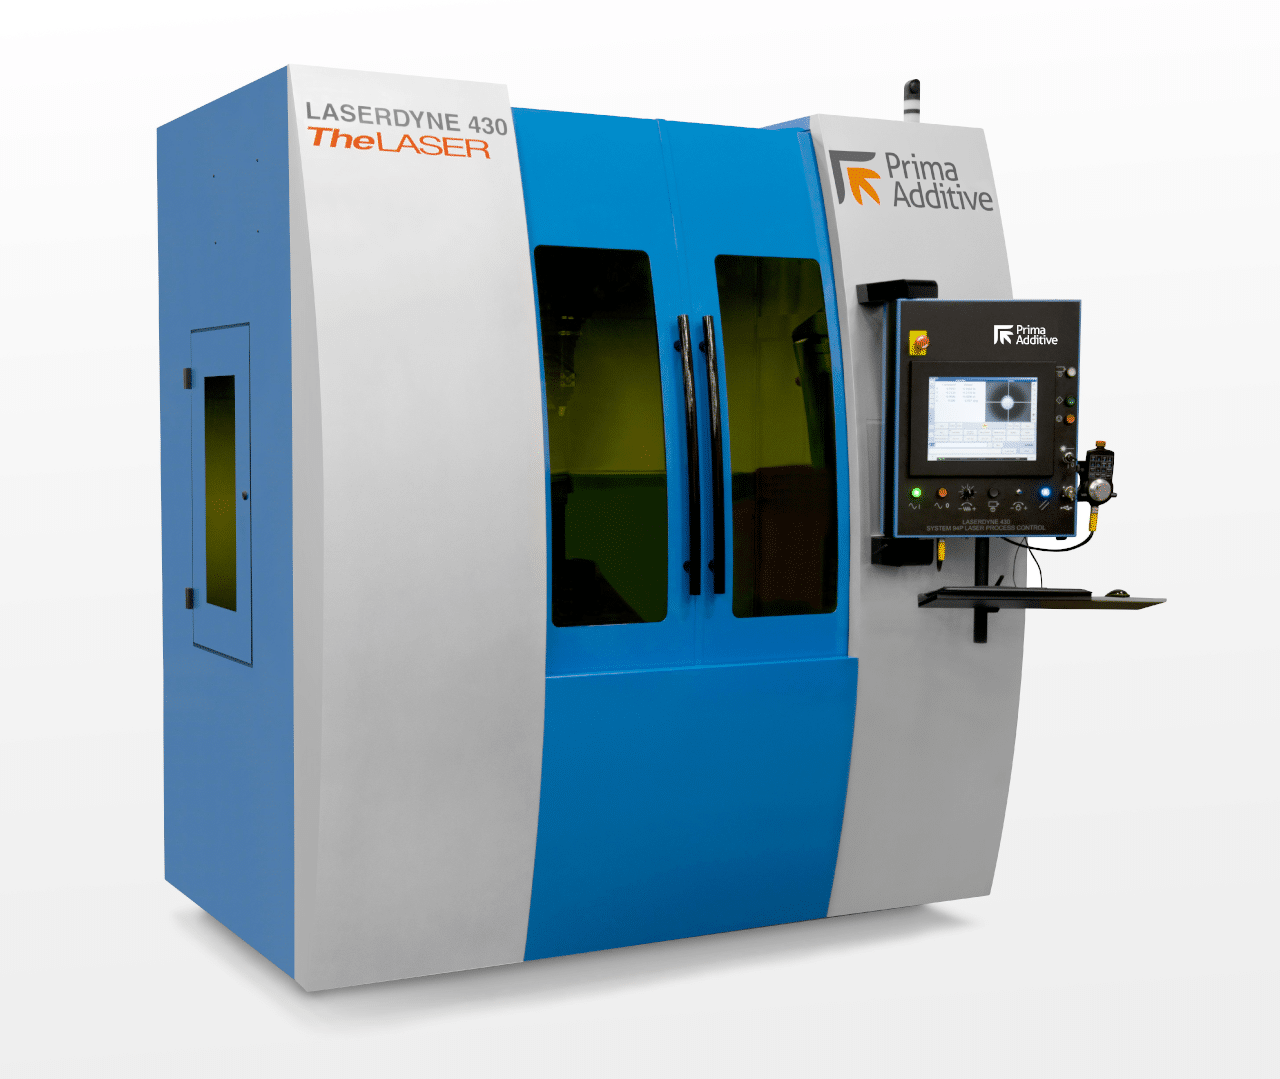 Laserdyne 430 Prima Additive - Imprimantes 3D